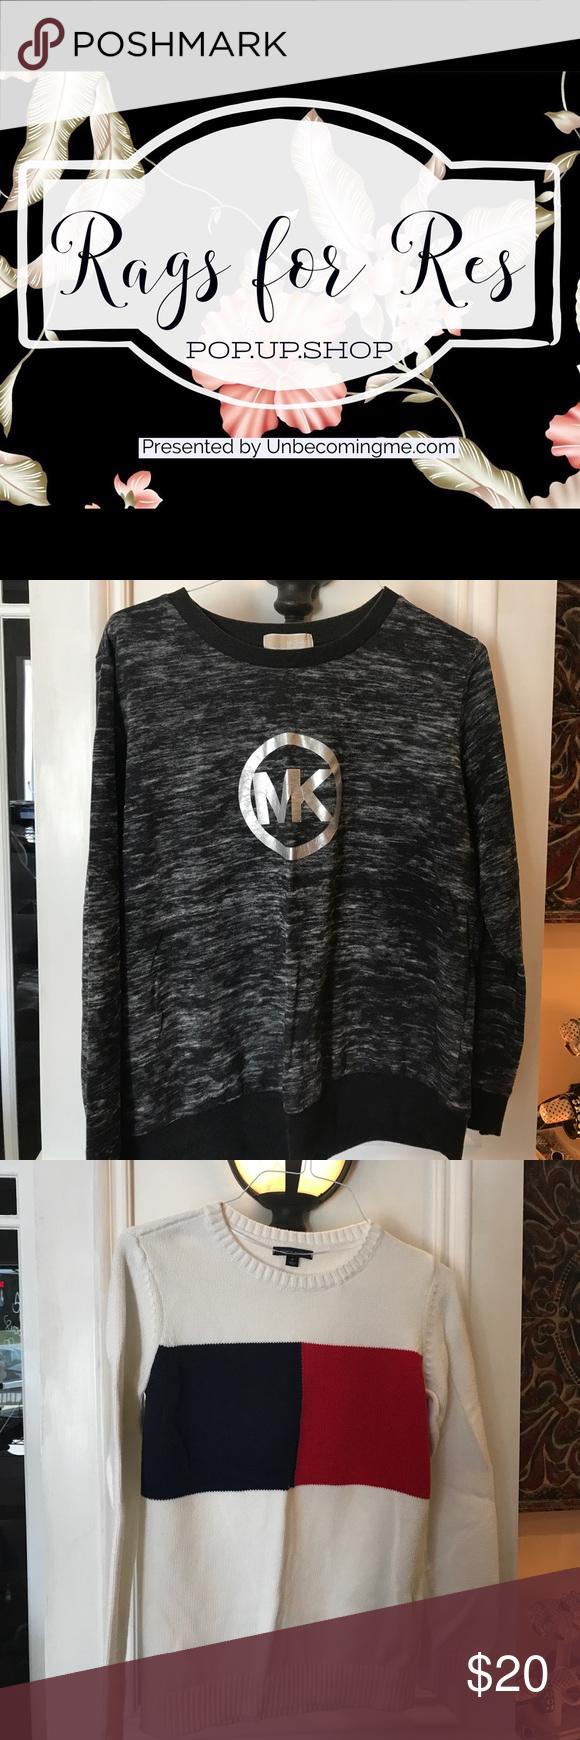 Sweaters, sweatshirts, blouses Michael Kors, Free people, Tommy Hilfiger Tops